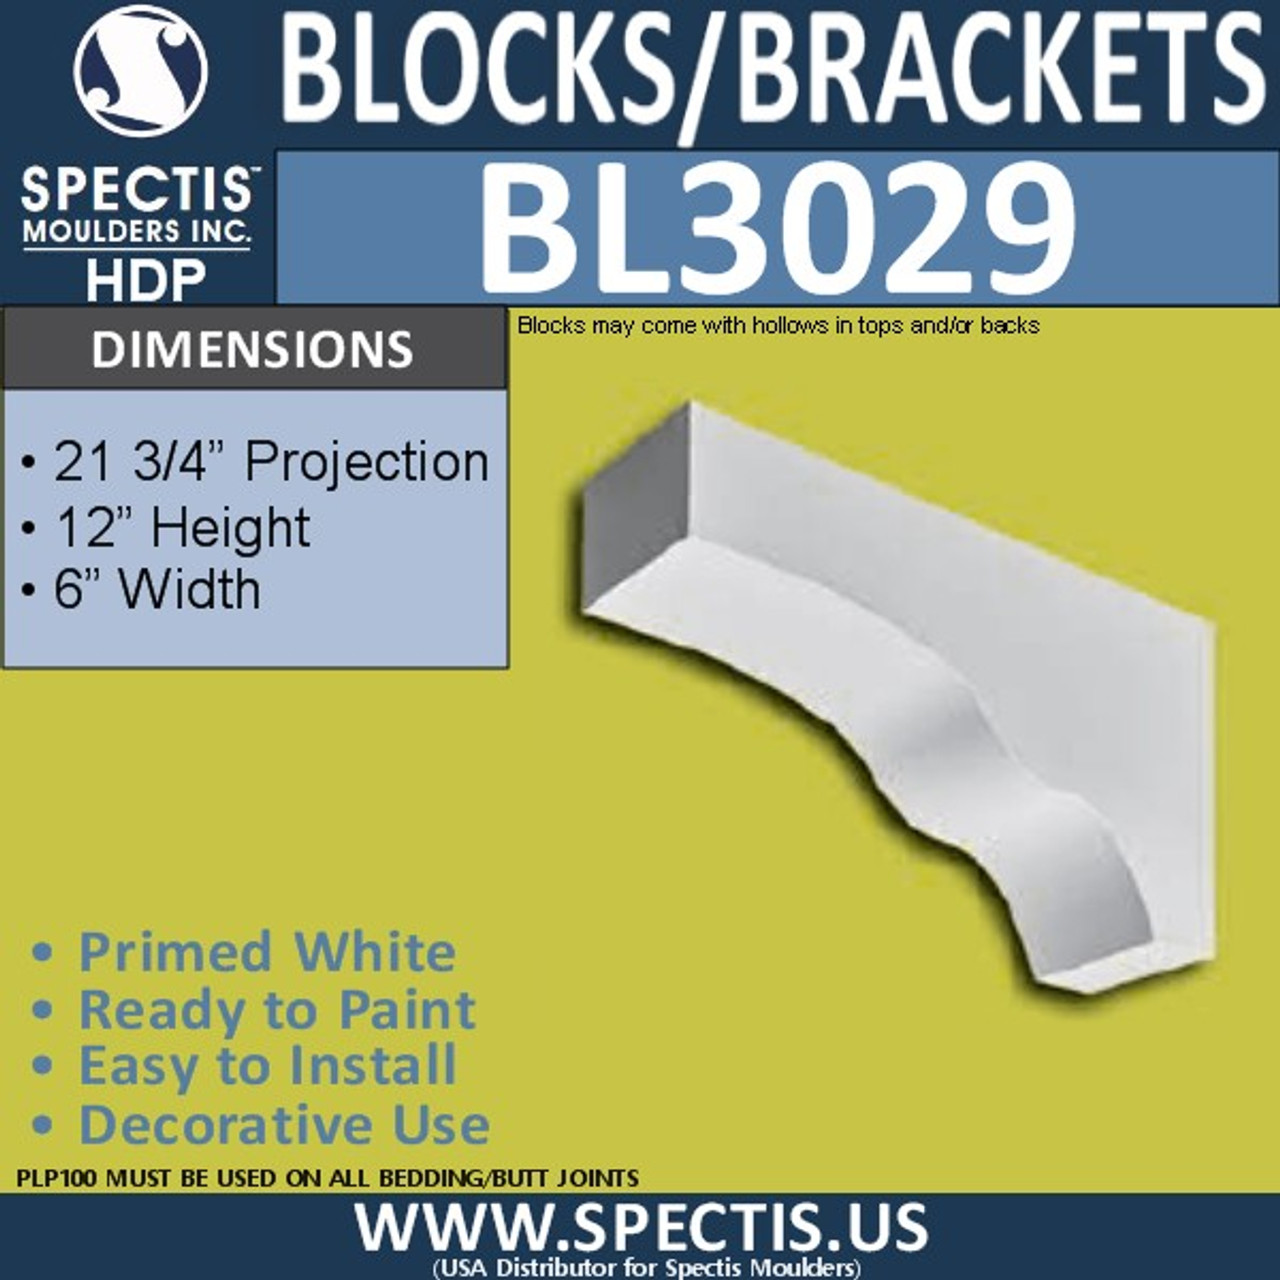 "BL3029 Eave Block or Bracket 6""W x 12""H x 21.75"" P"